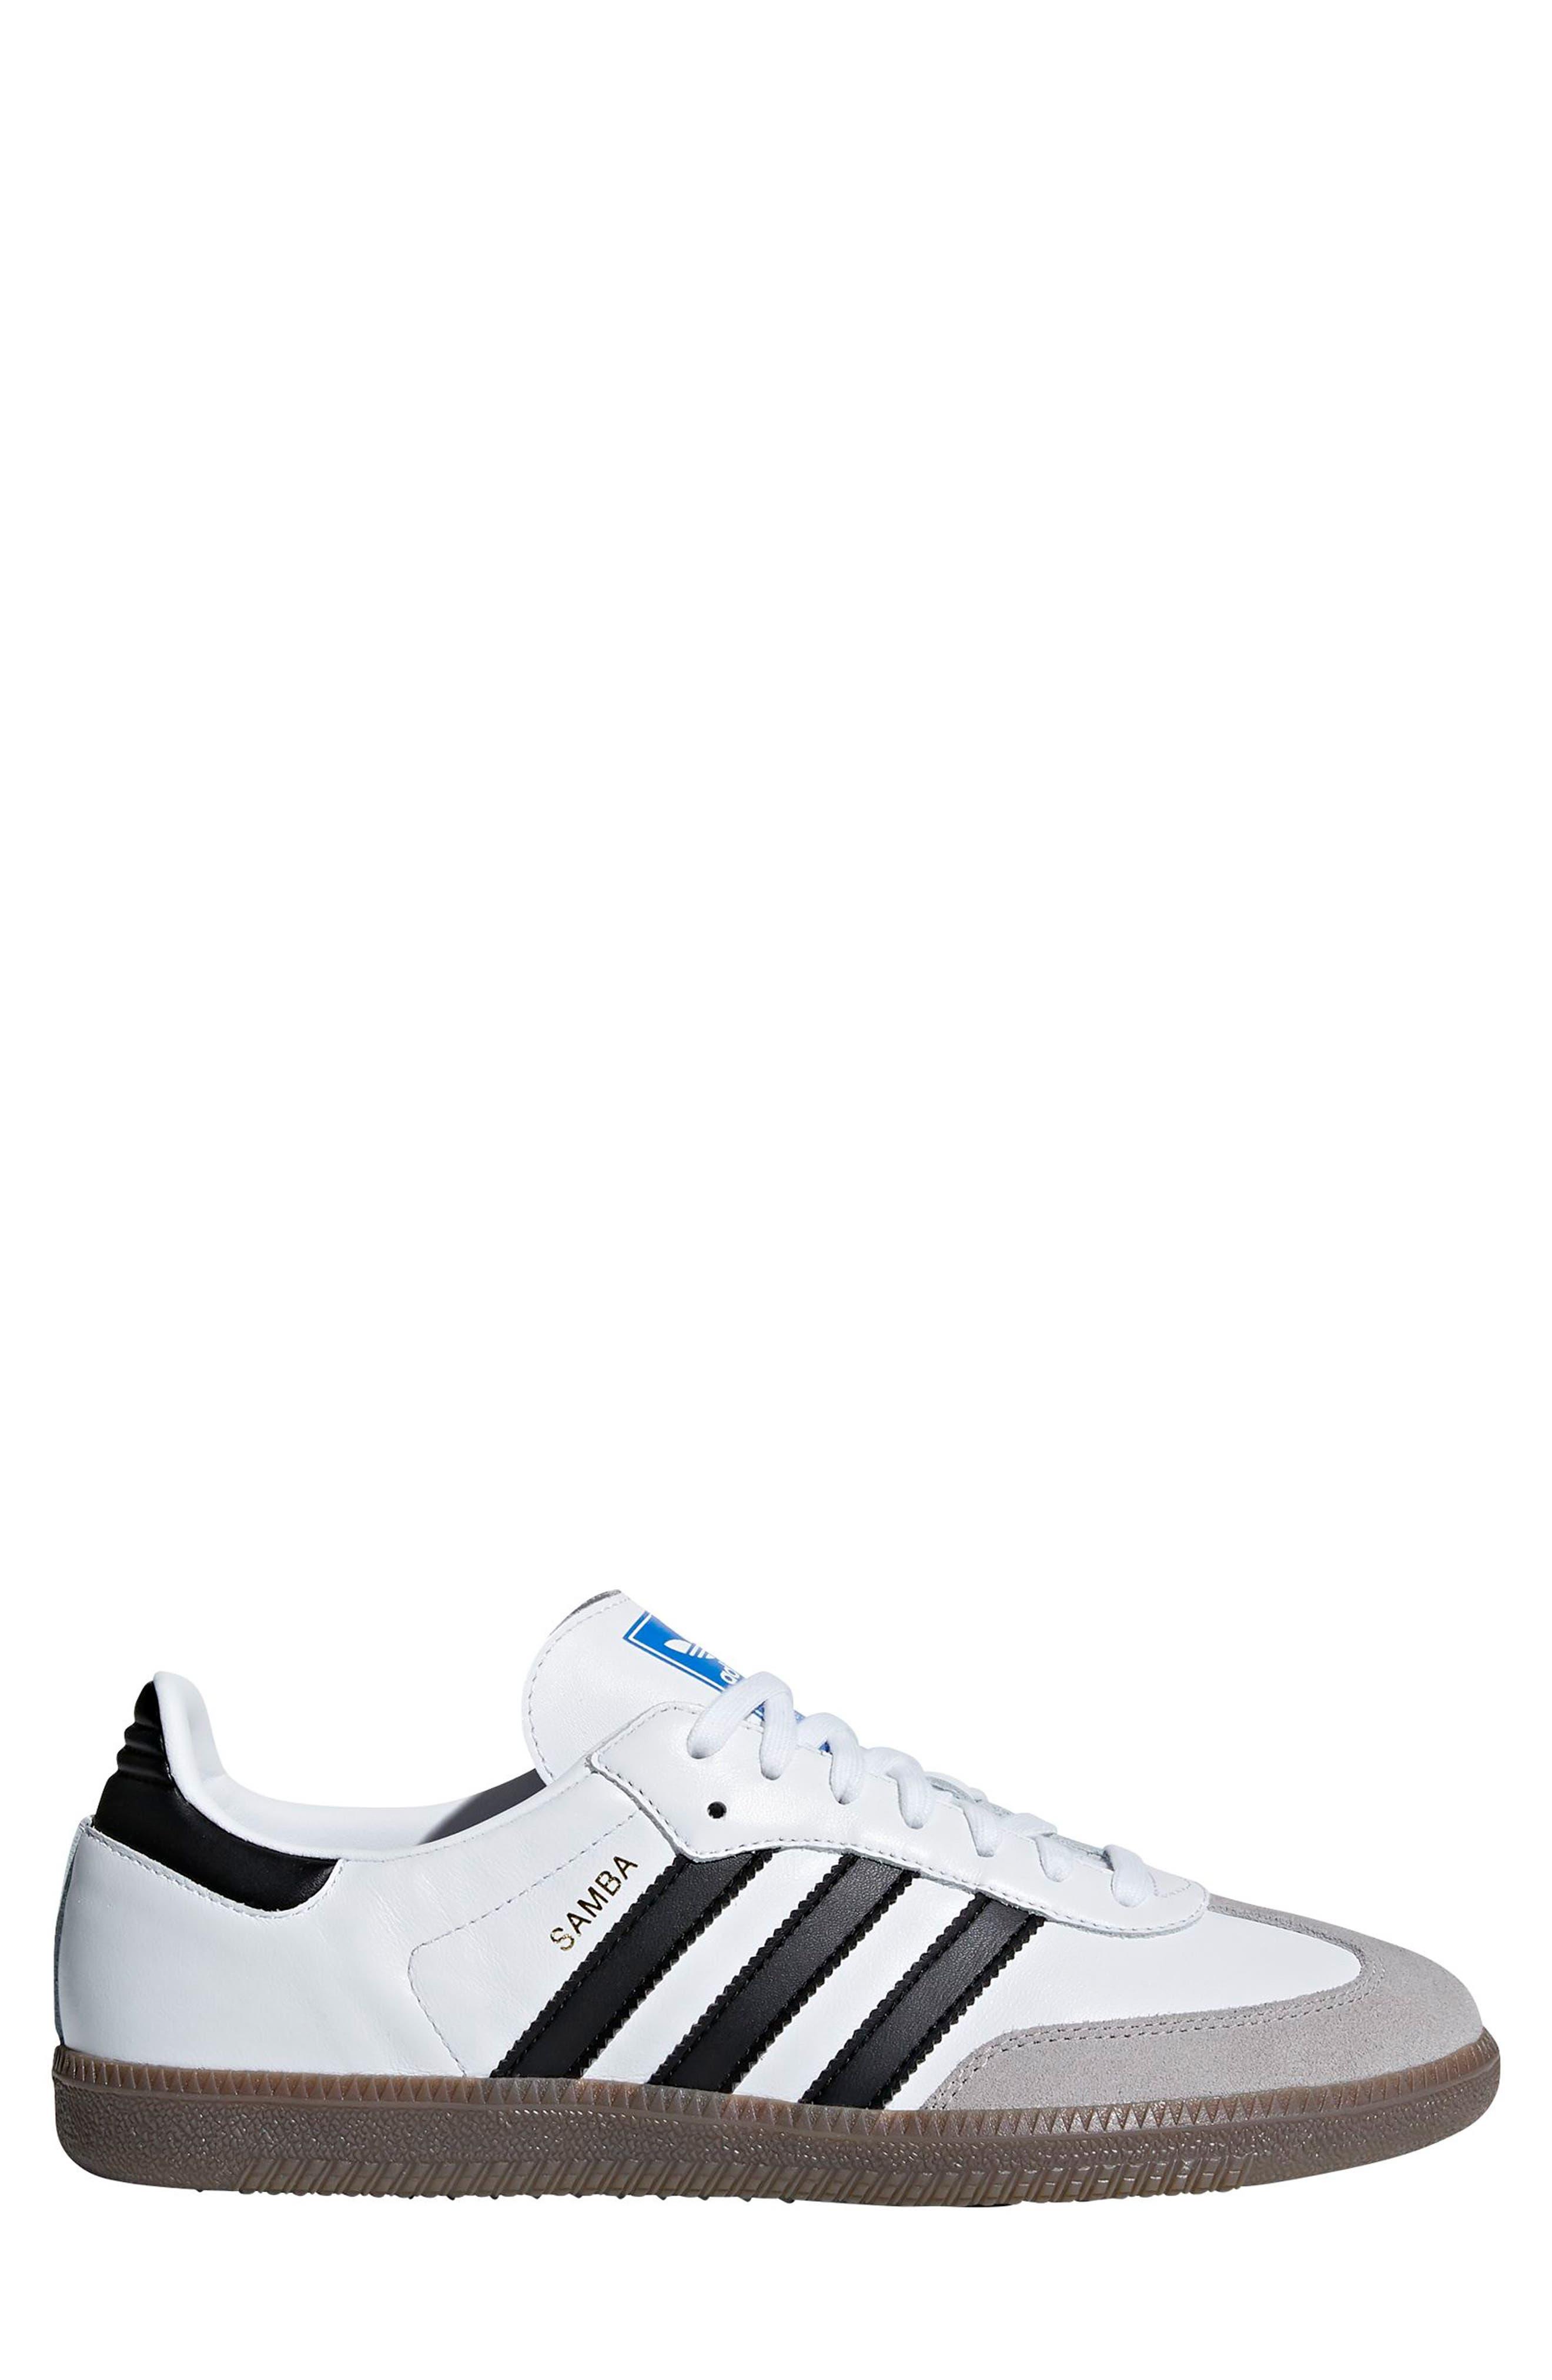 adidas Originals Sko Lacome Ftwr WhiteCore BlackCream White